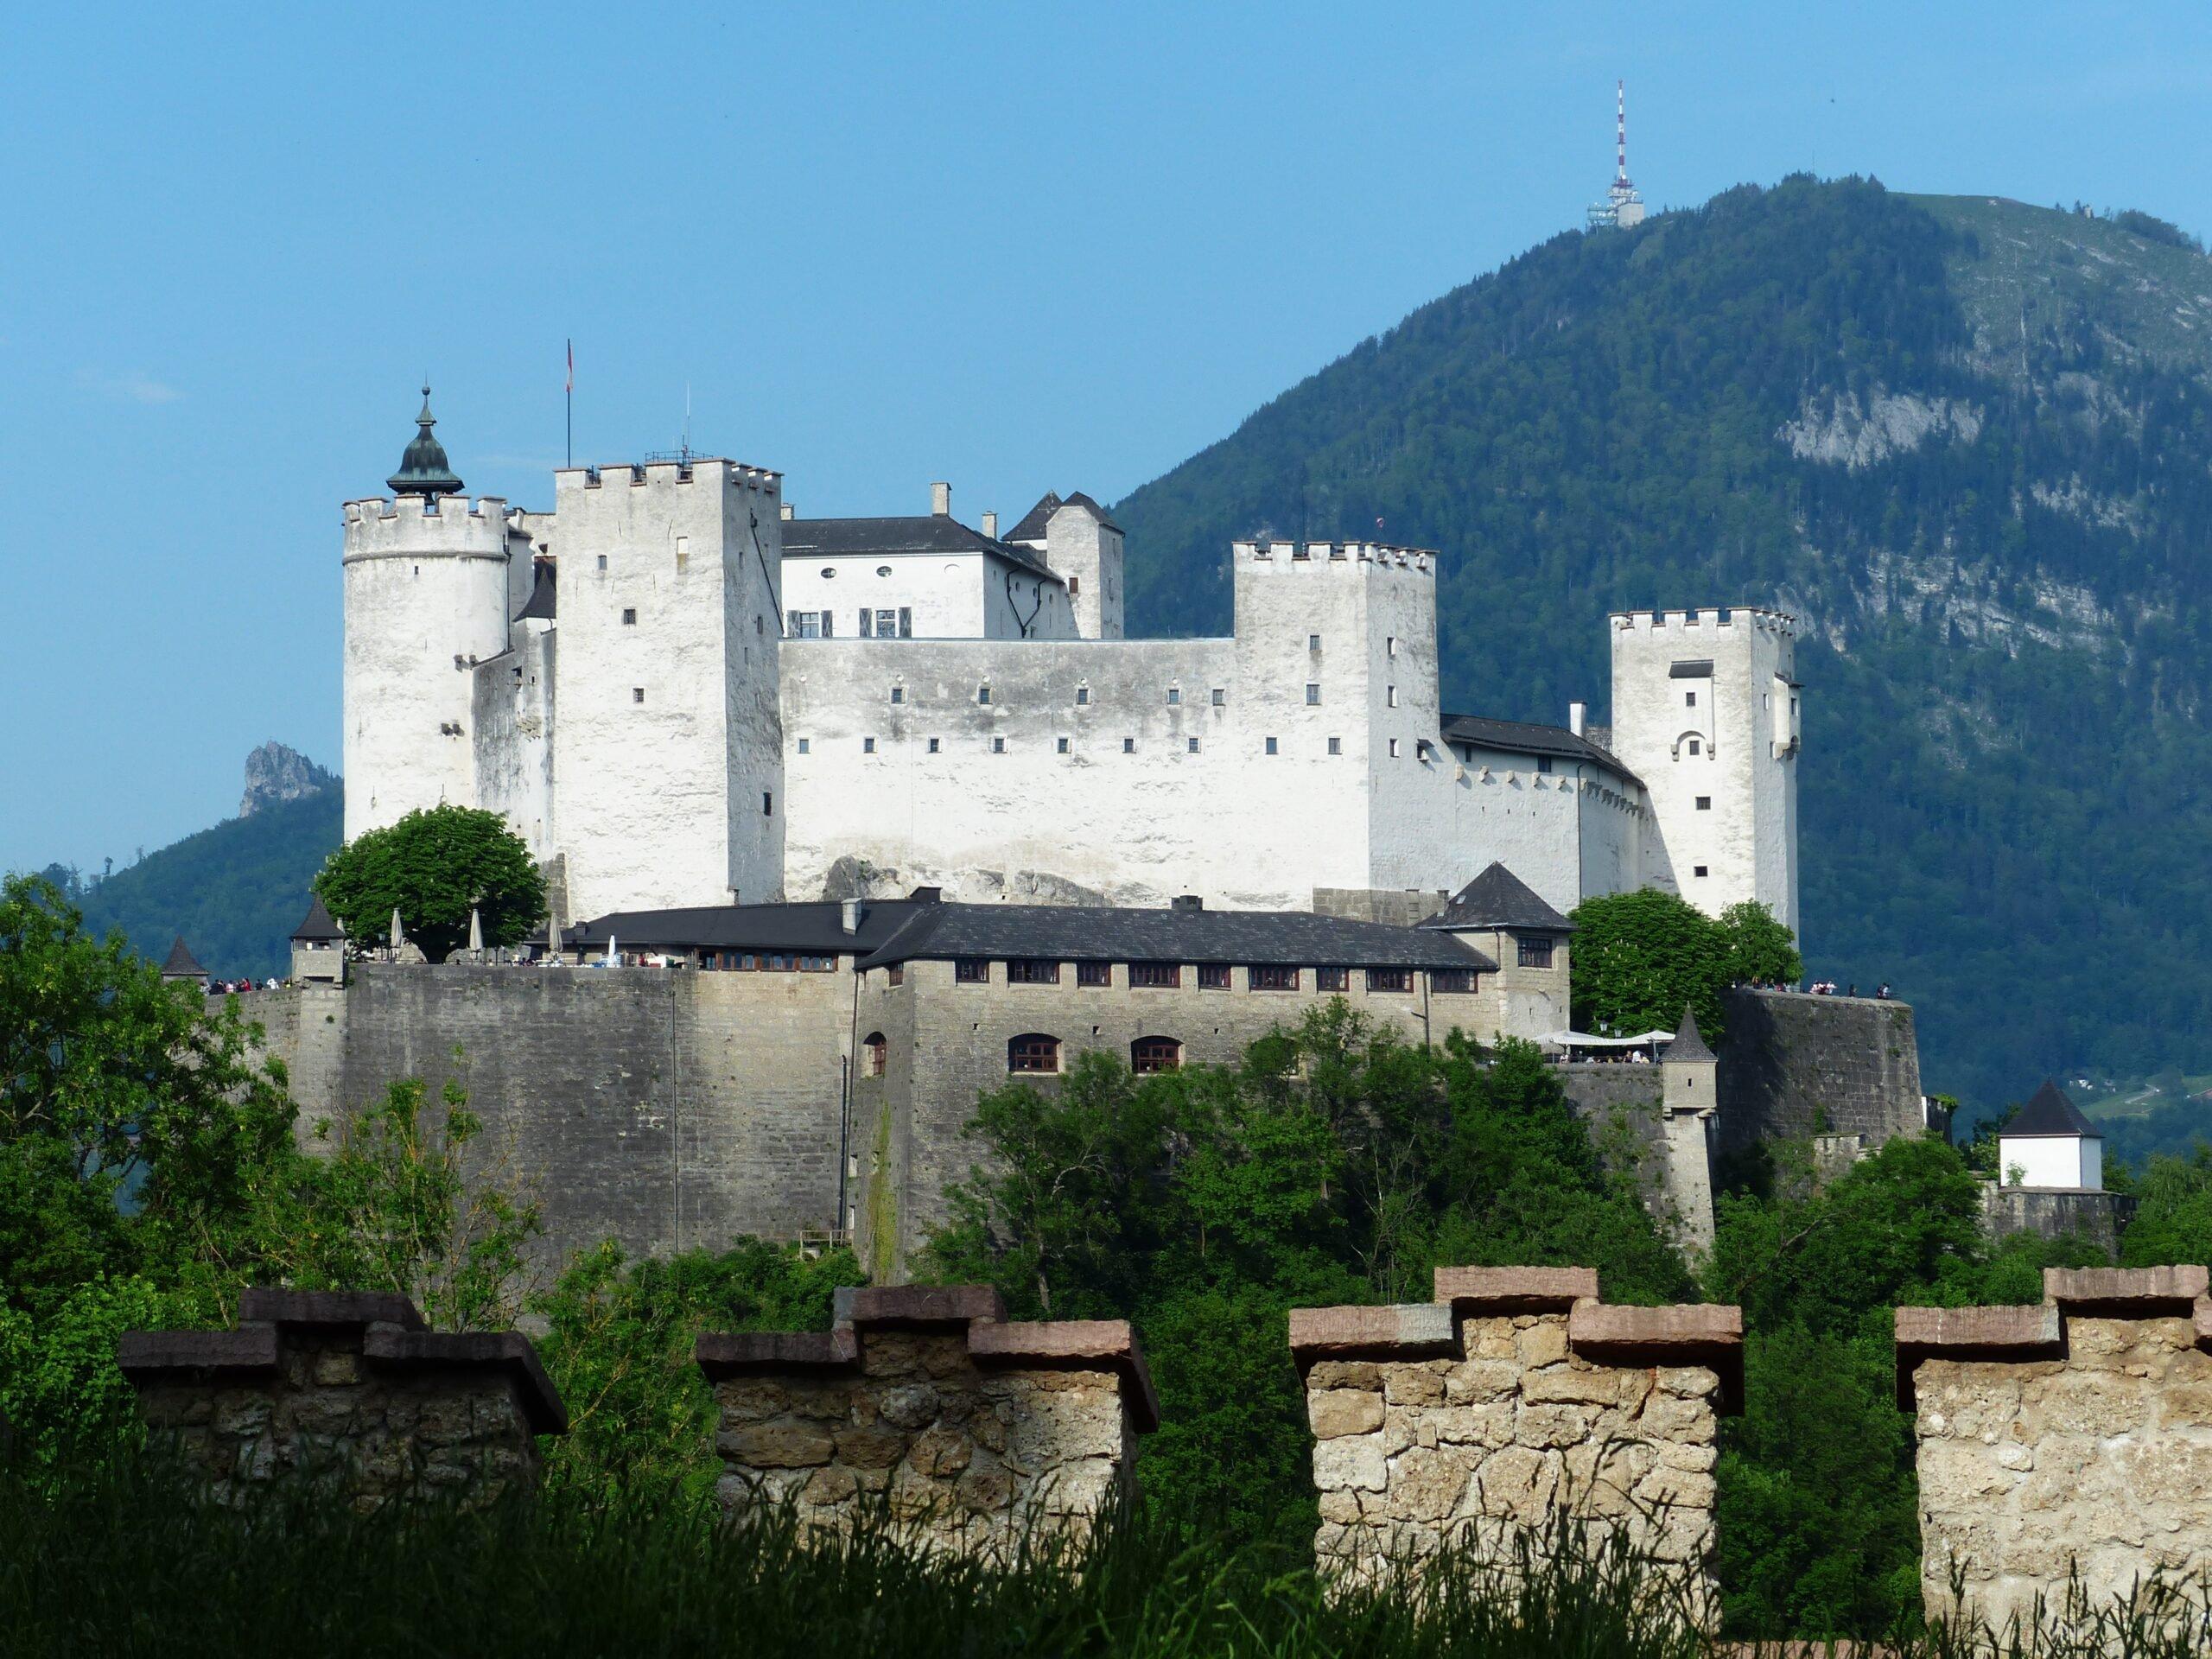 Hohensalzburg Castle with Gaisberg mountain in background (photo: Hans Braxmeier, Pixabay)